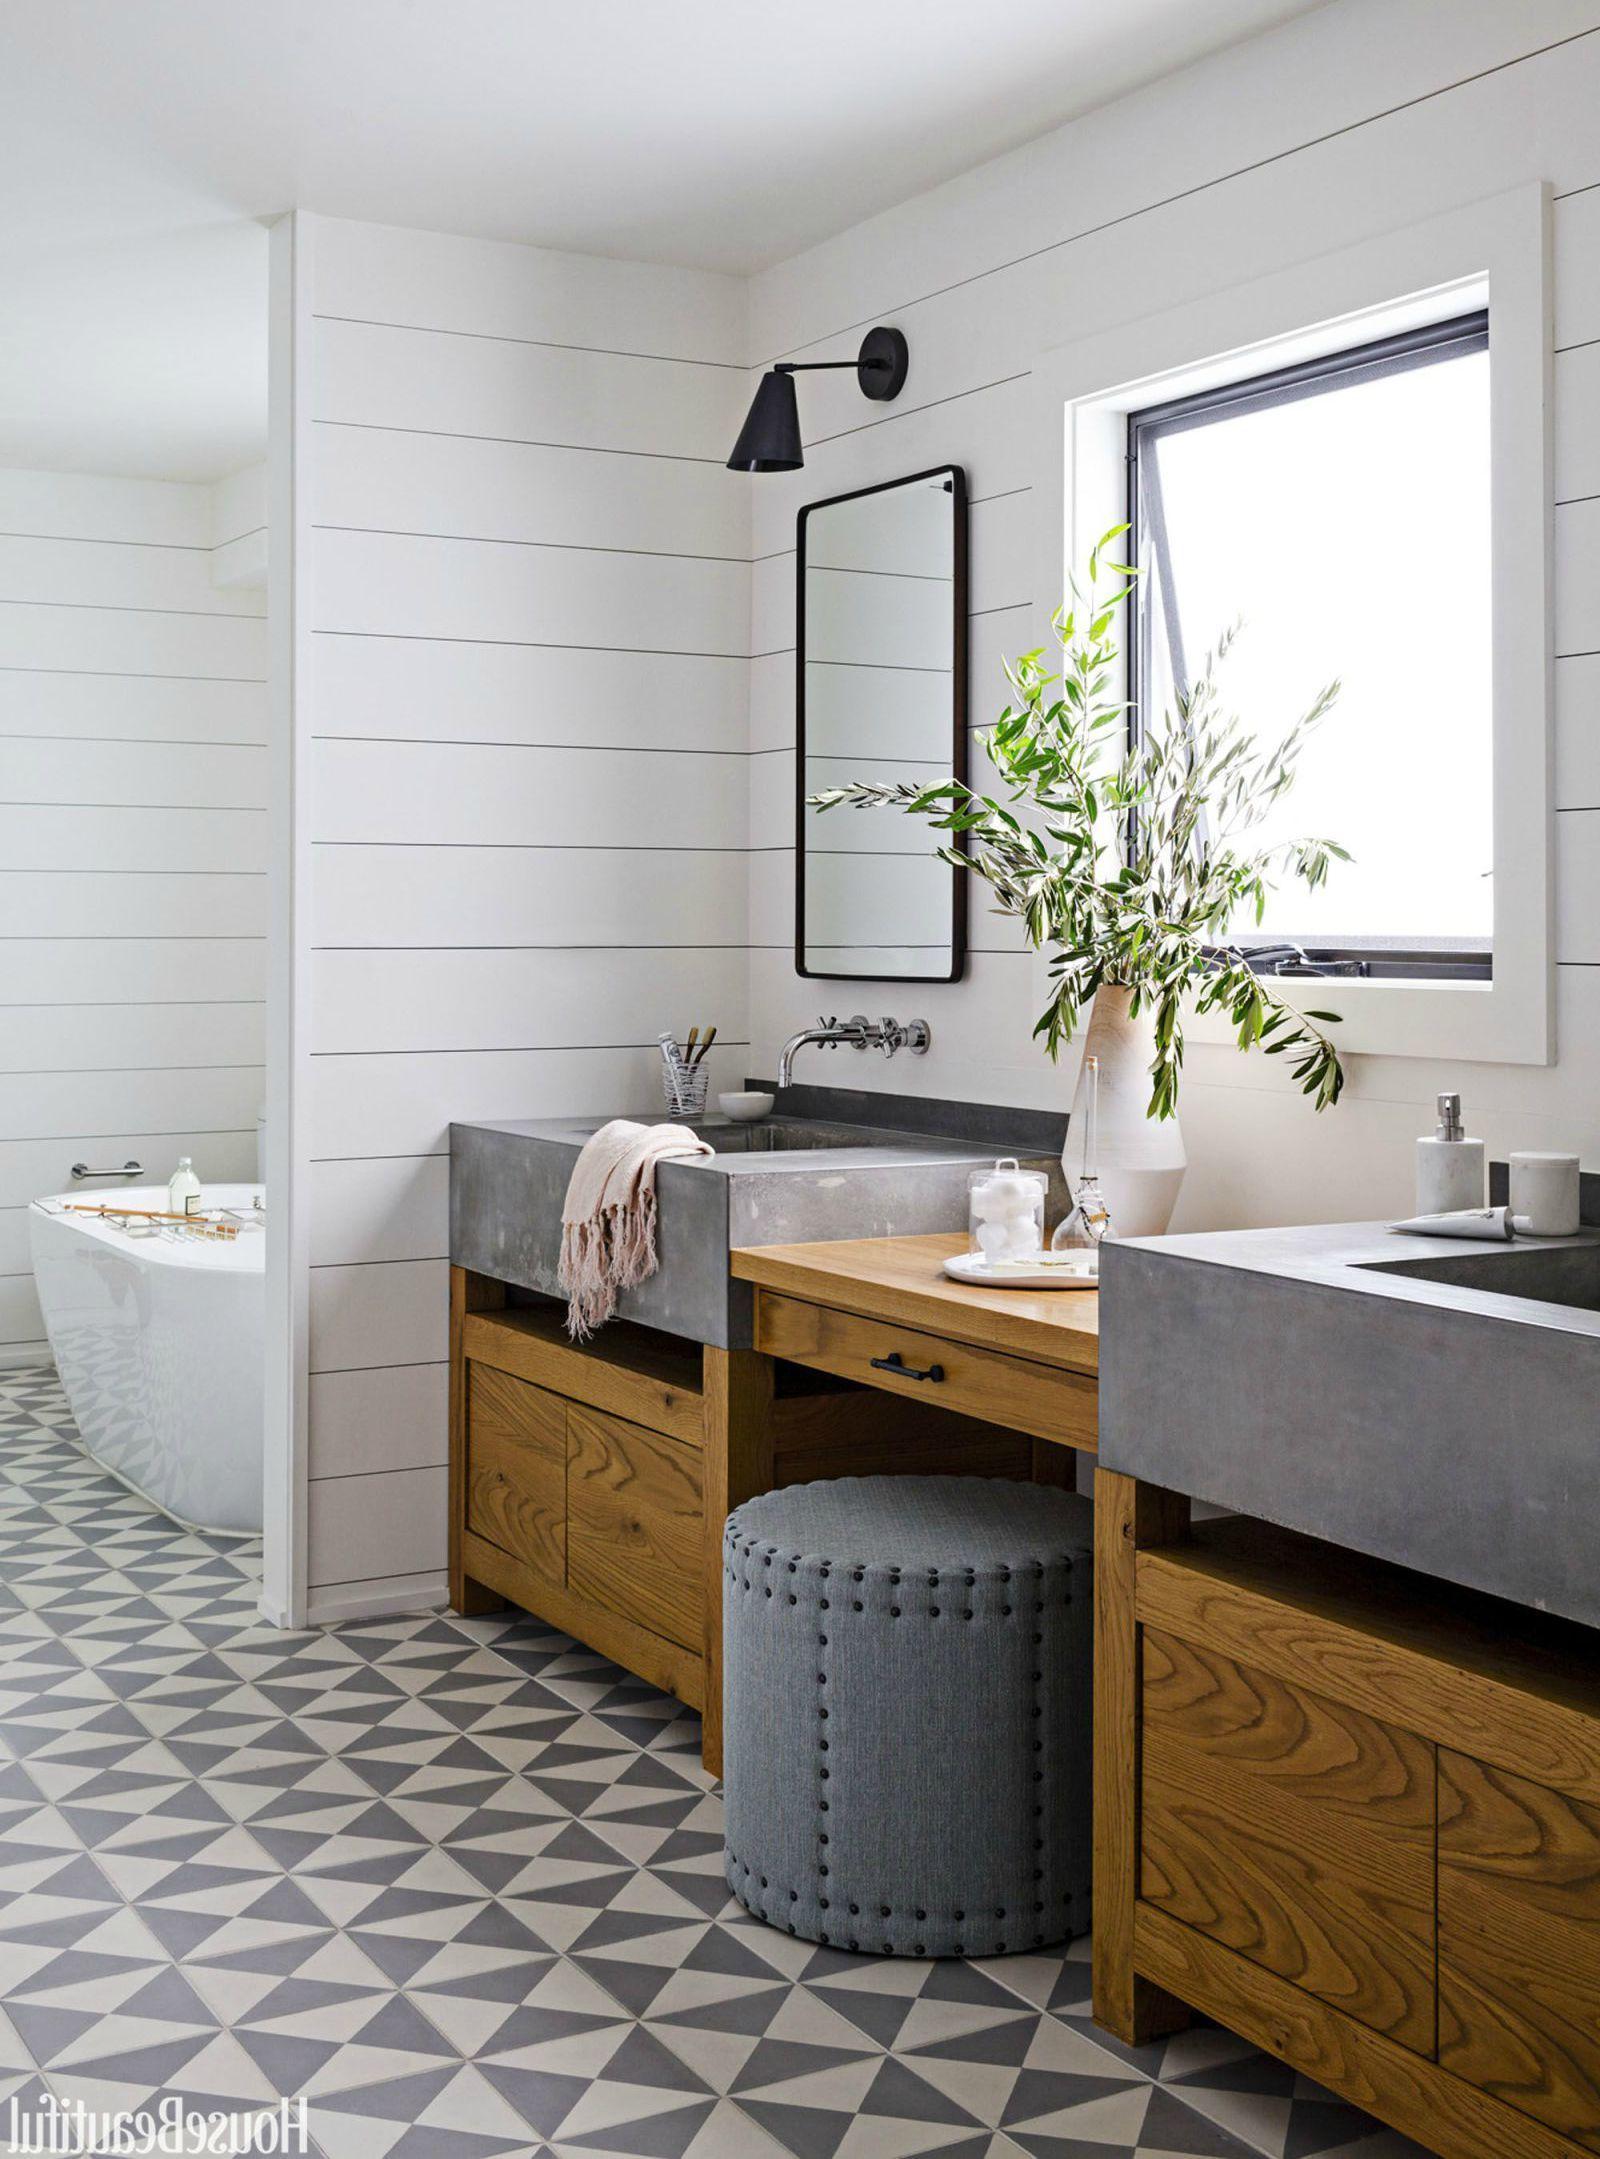 Best Large Bathroom Ideas Inspiration Largebathroomideas Bathroomideas Bathroomdesign Hou Bathroom Remodel Master Top Bathroom Design Bathroom Tile Designs